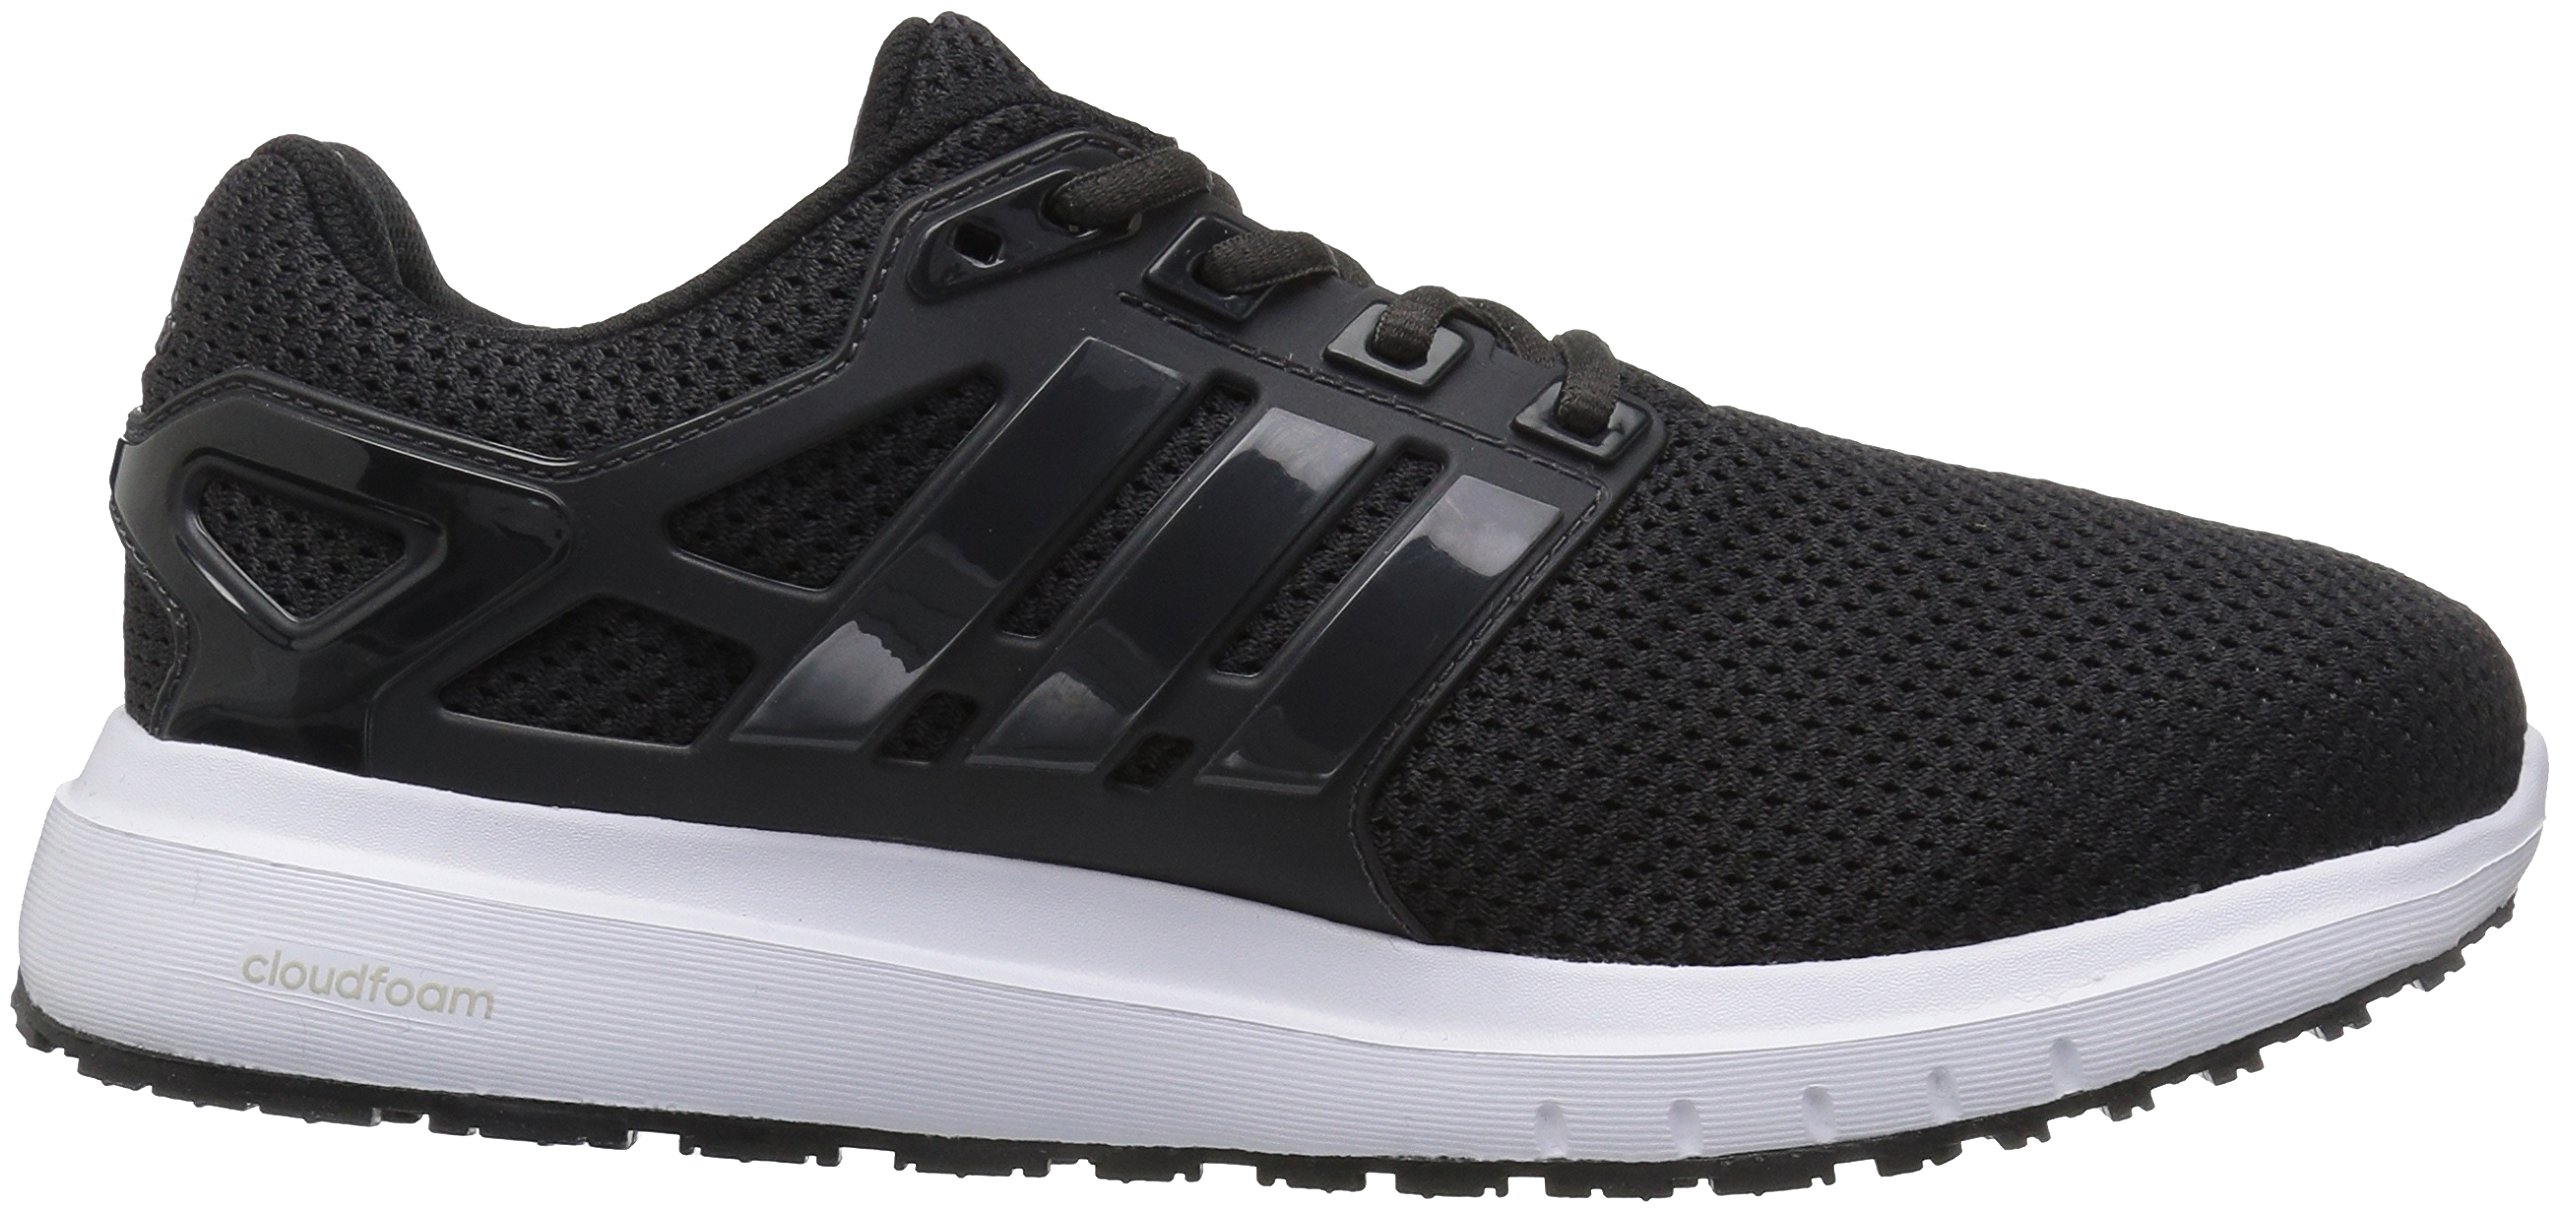 adidas  Men's Energy Cloud Wide m Running Shoe, BLACK/UTILITY BLACK/WHITE, 10.5 2E US by adidas (Image #7)